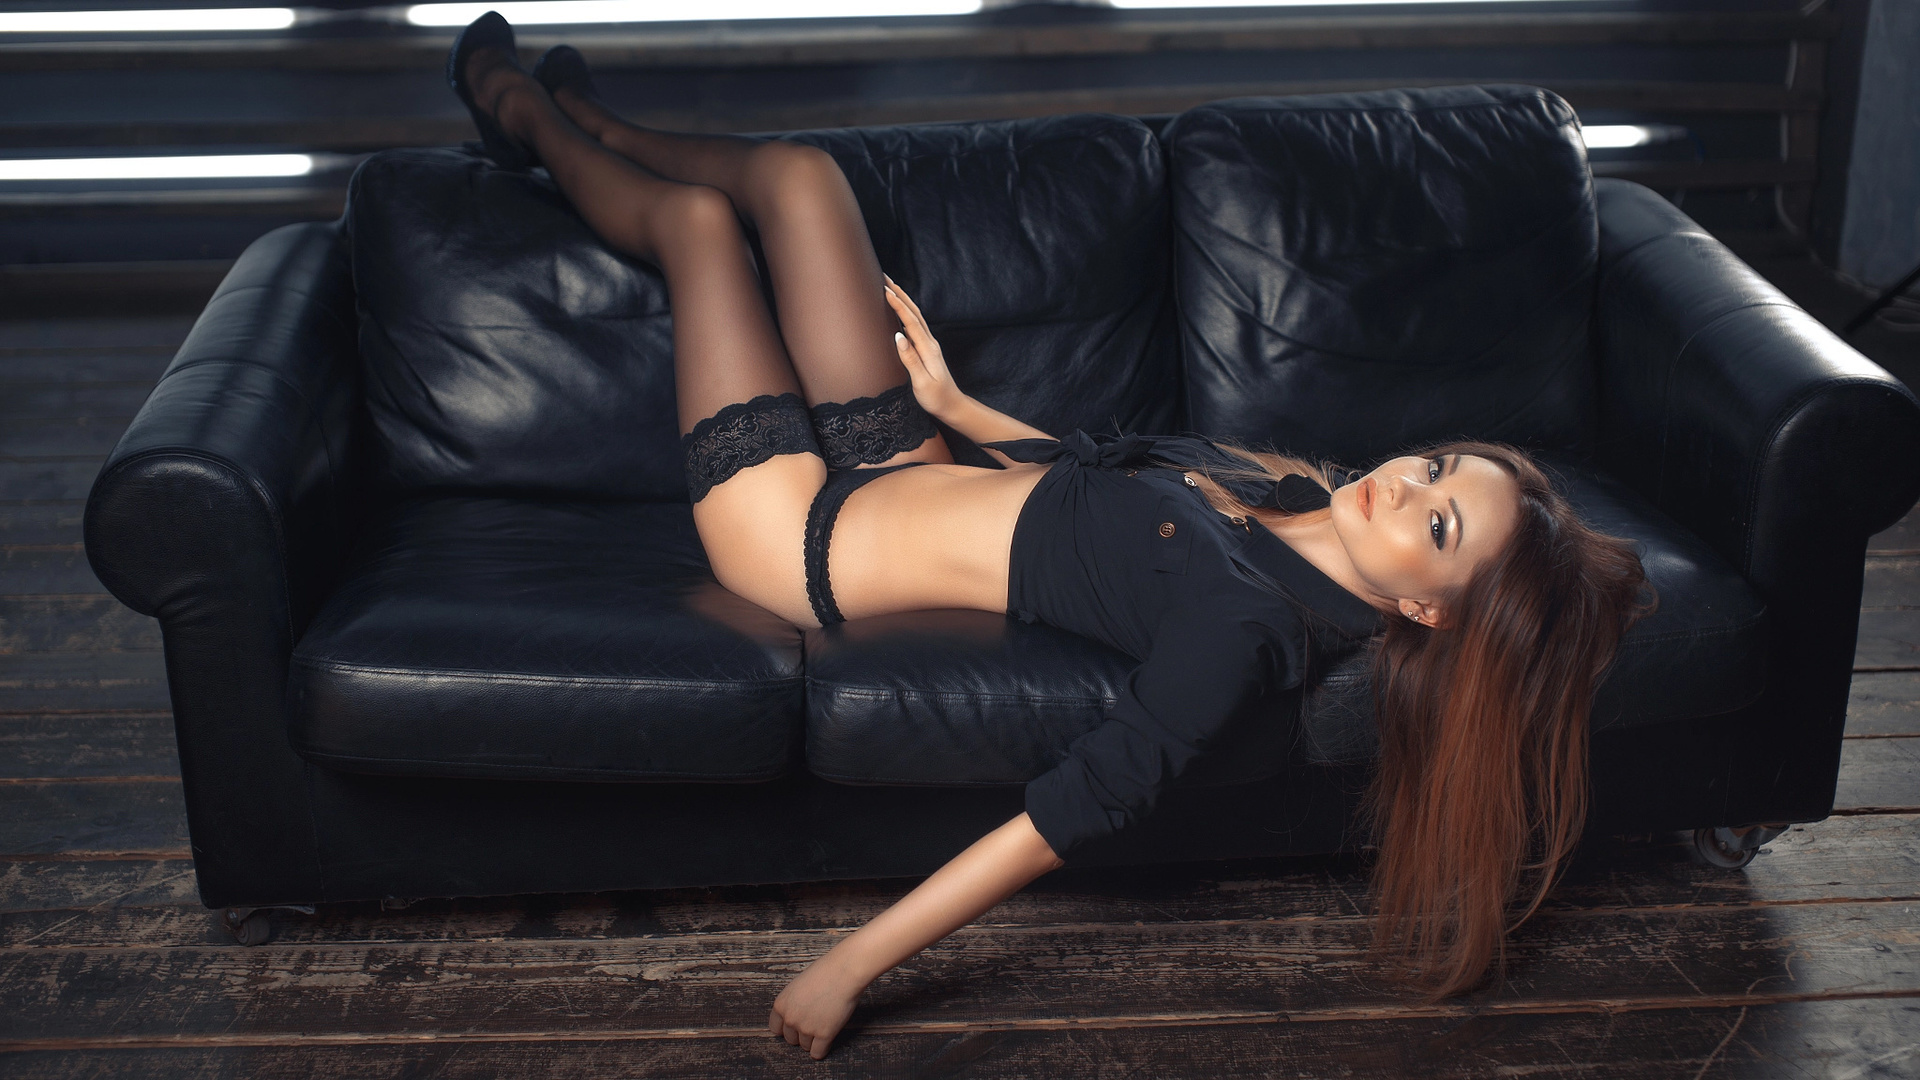 Голая красотка на кожаном диване